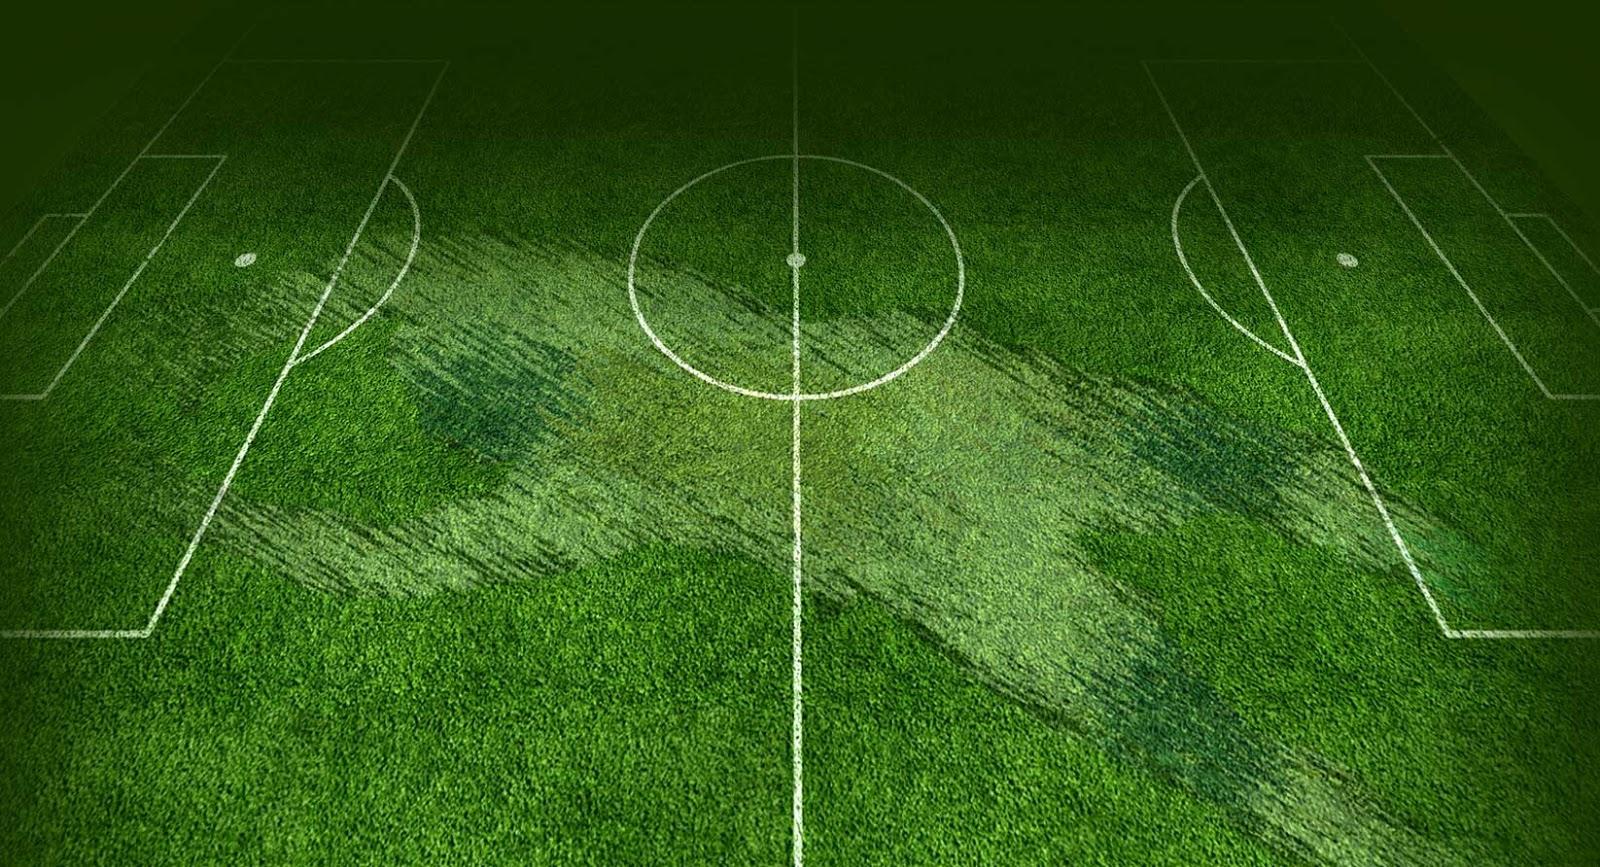 Fondo De Pantalla Linda Futbol: FONDOS PARA FOTOS